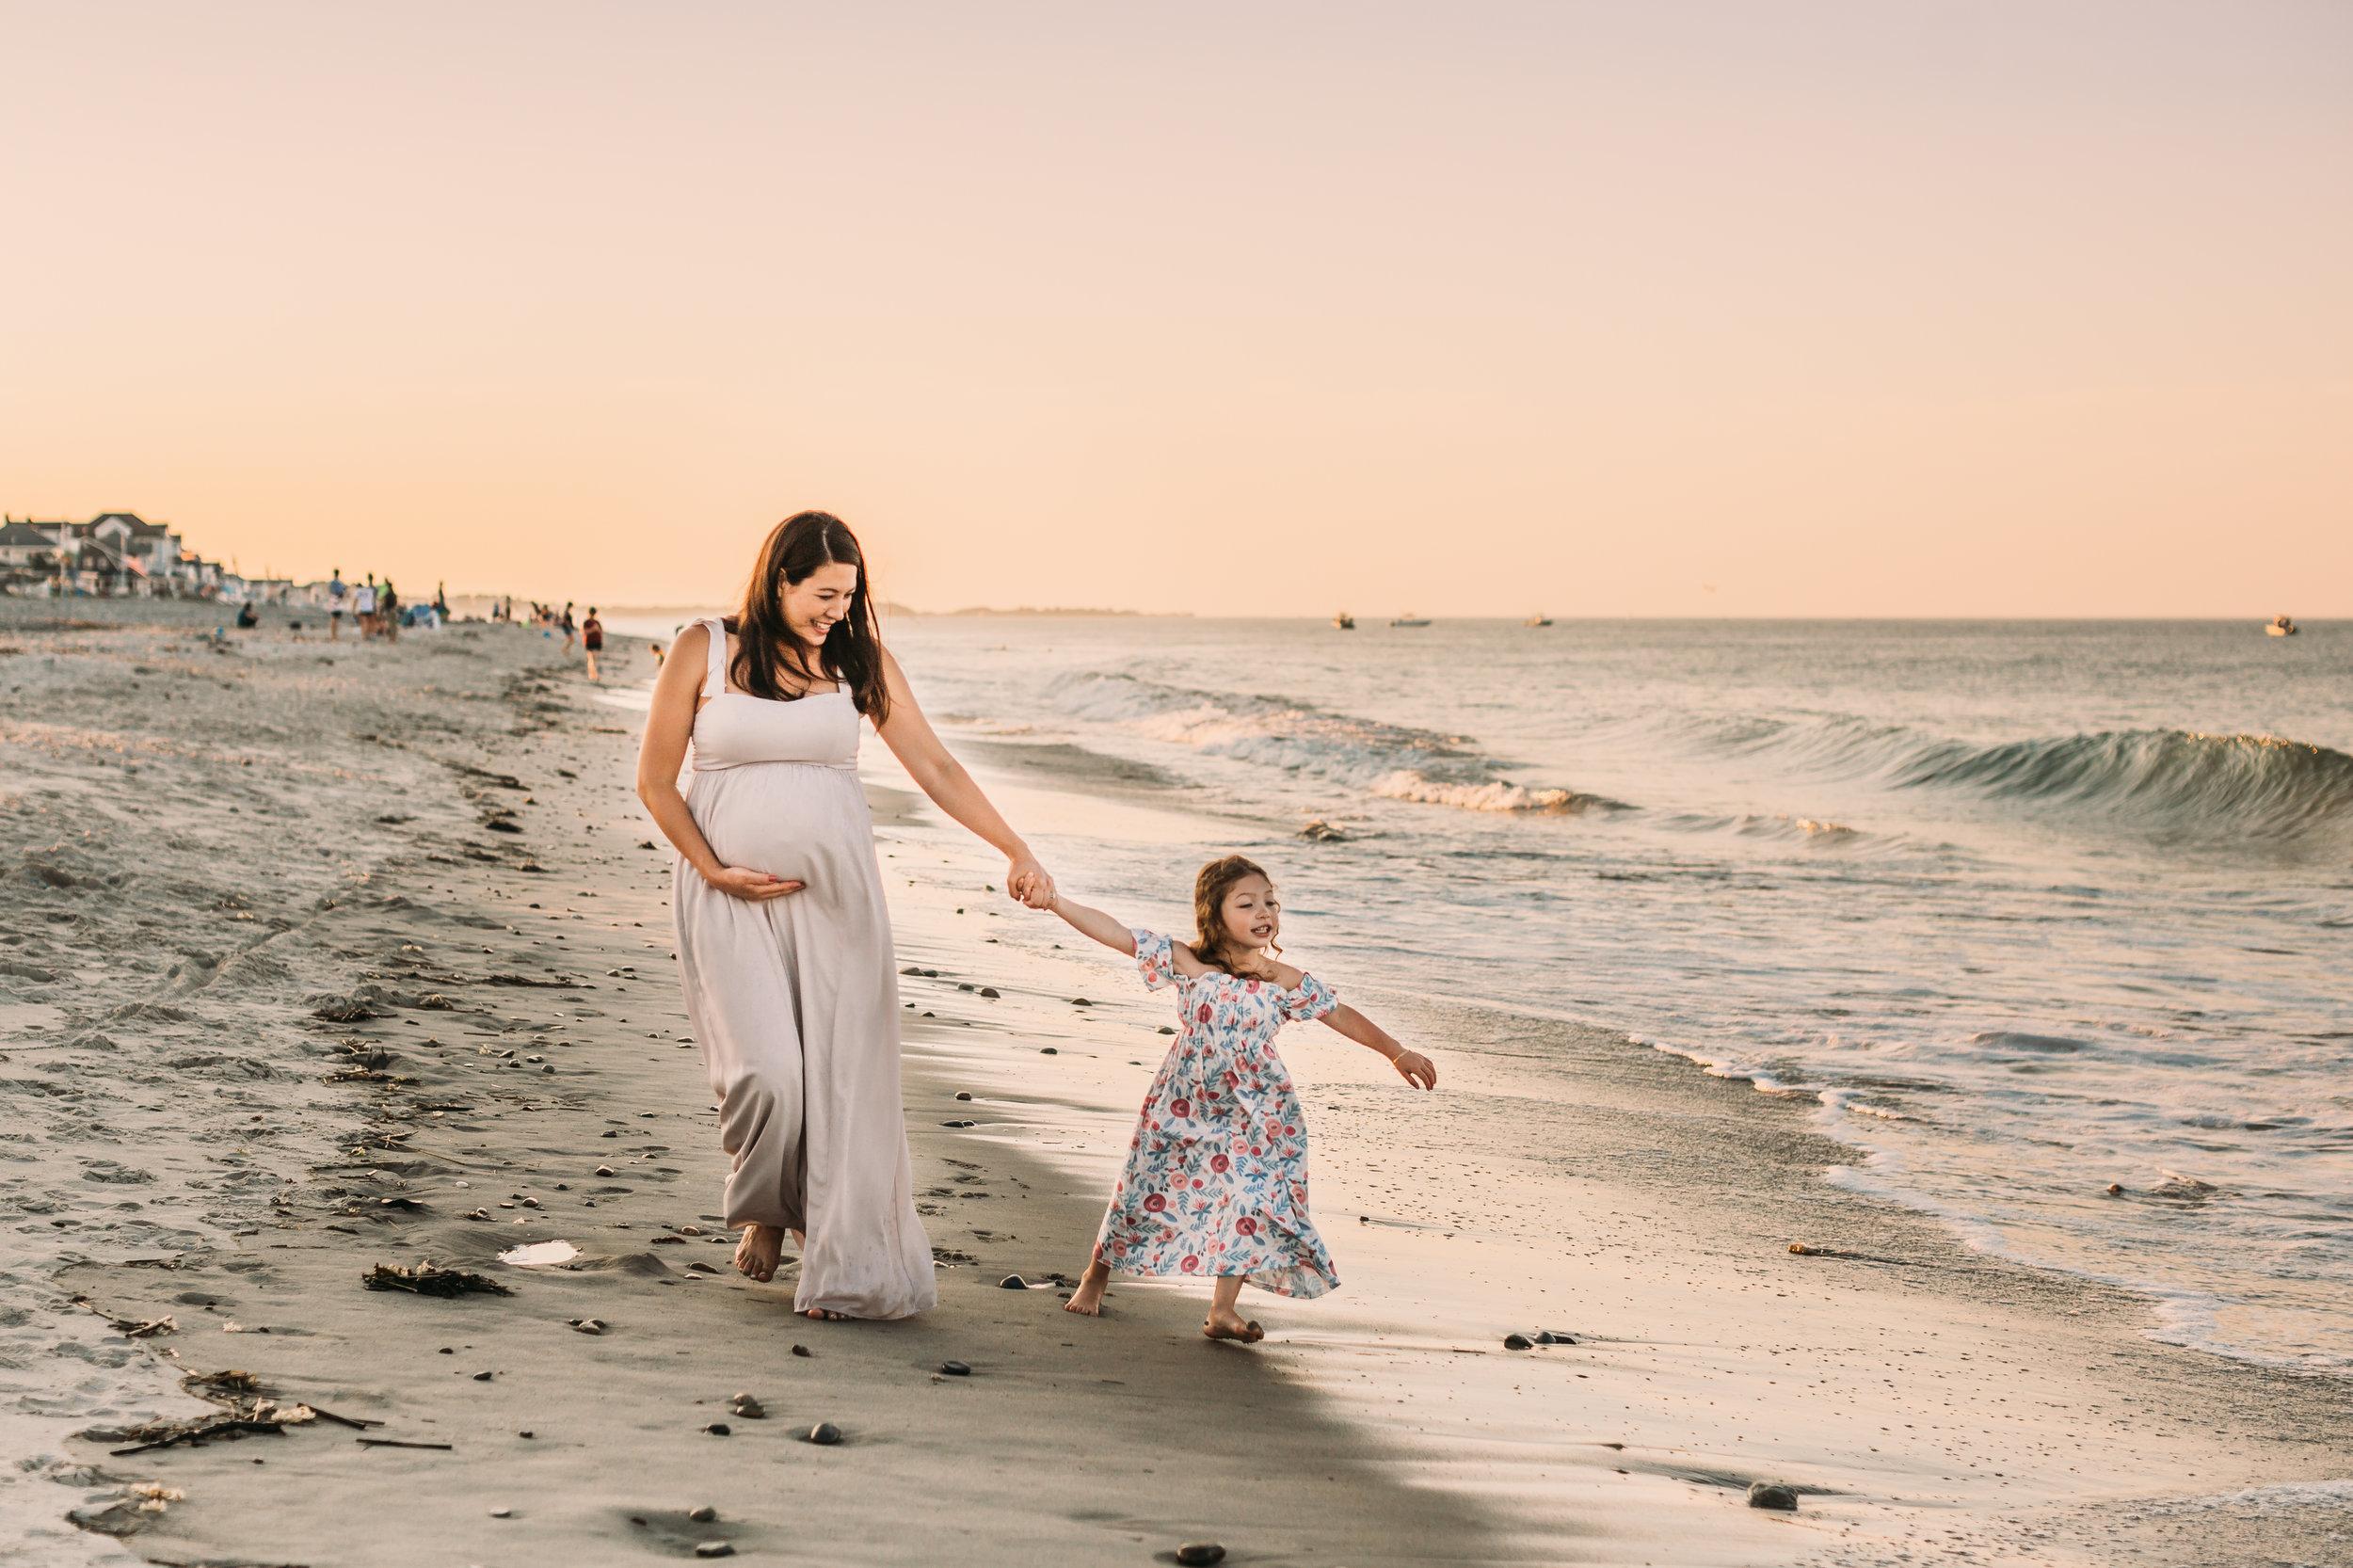 Scituate, Massachusetts Sunset Maternity Photography Session